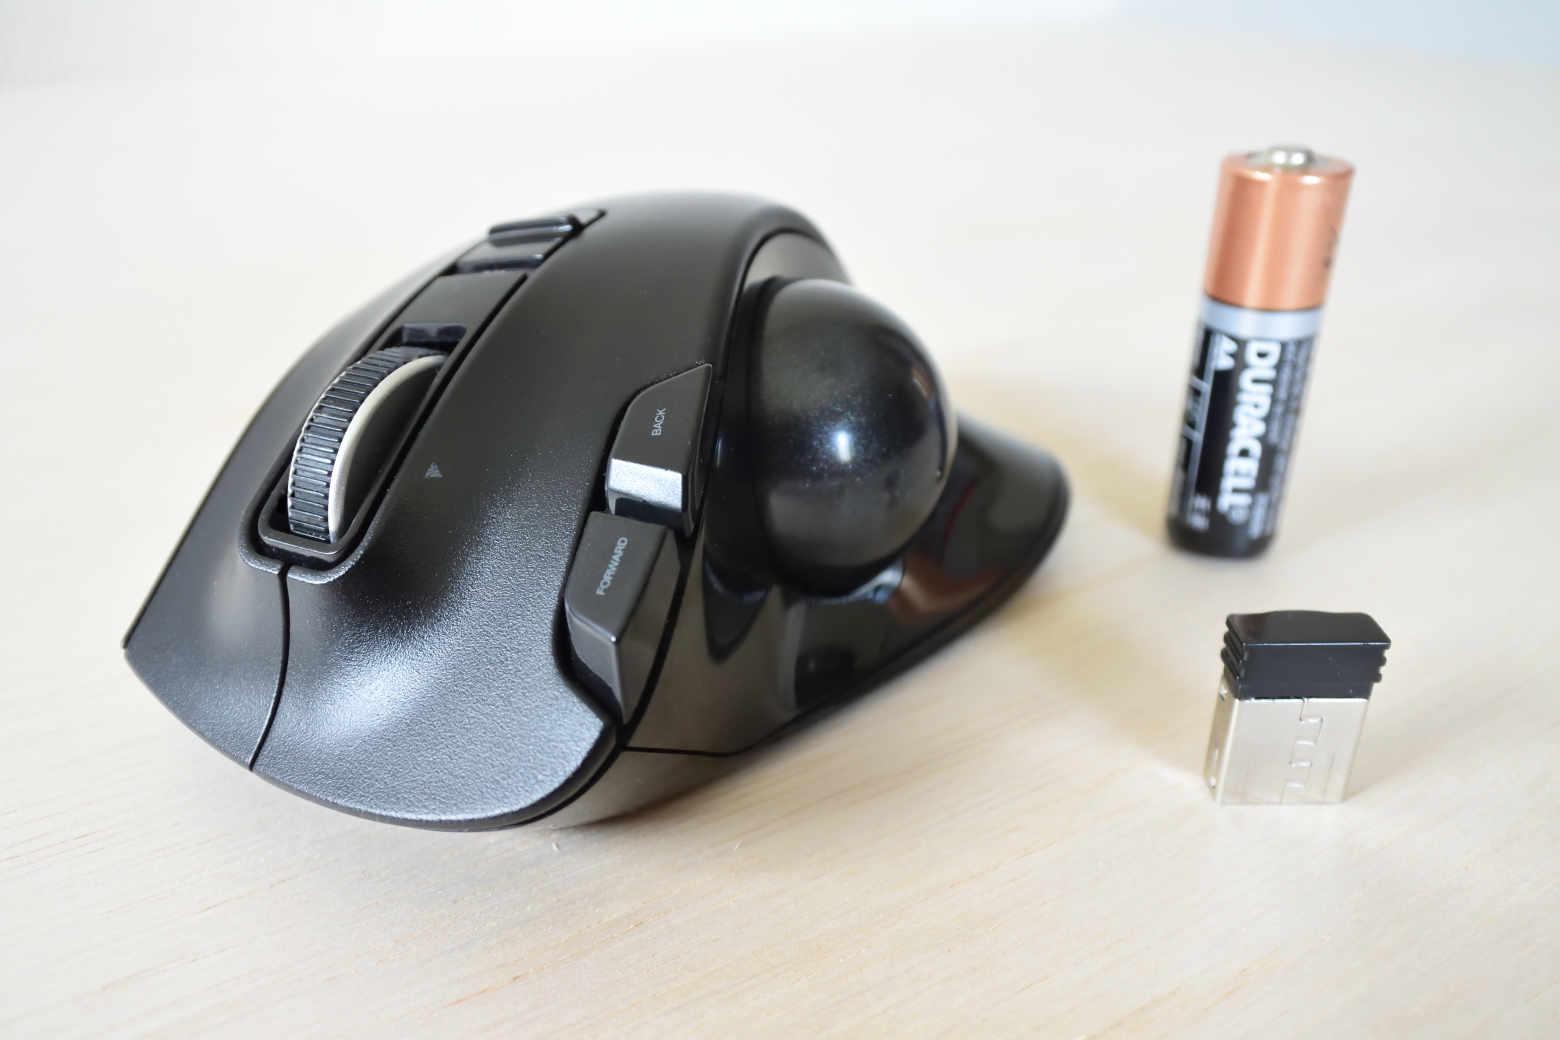 M-XT3DRBK:多いボタンが特徴のエレコム製トラックボールマウス【インプレ】